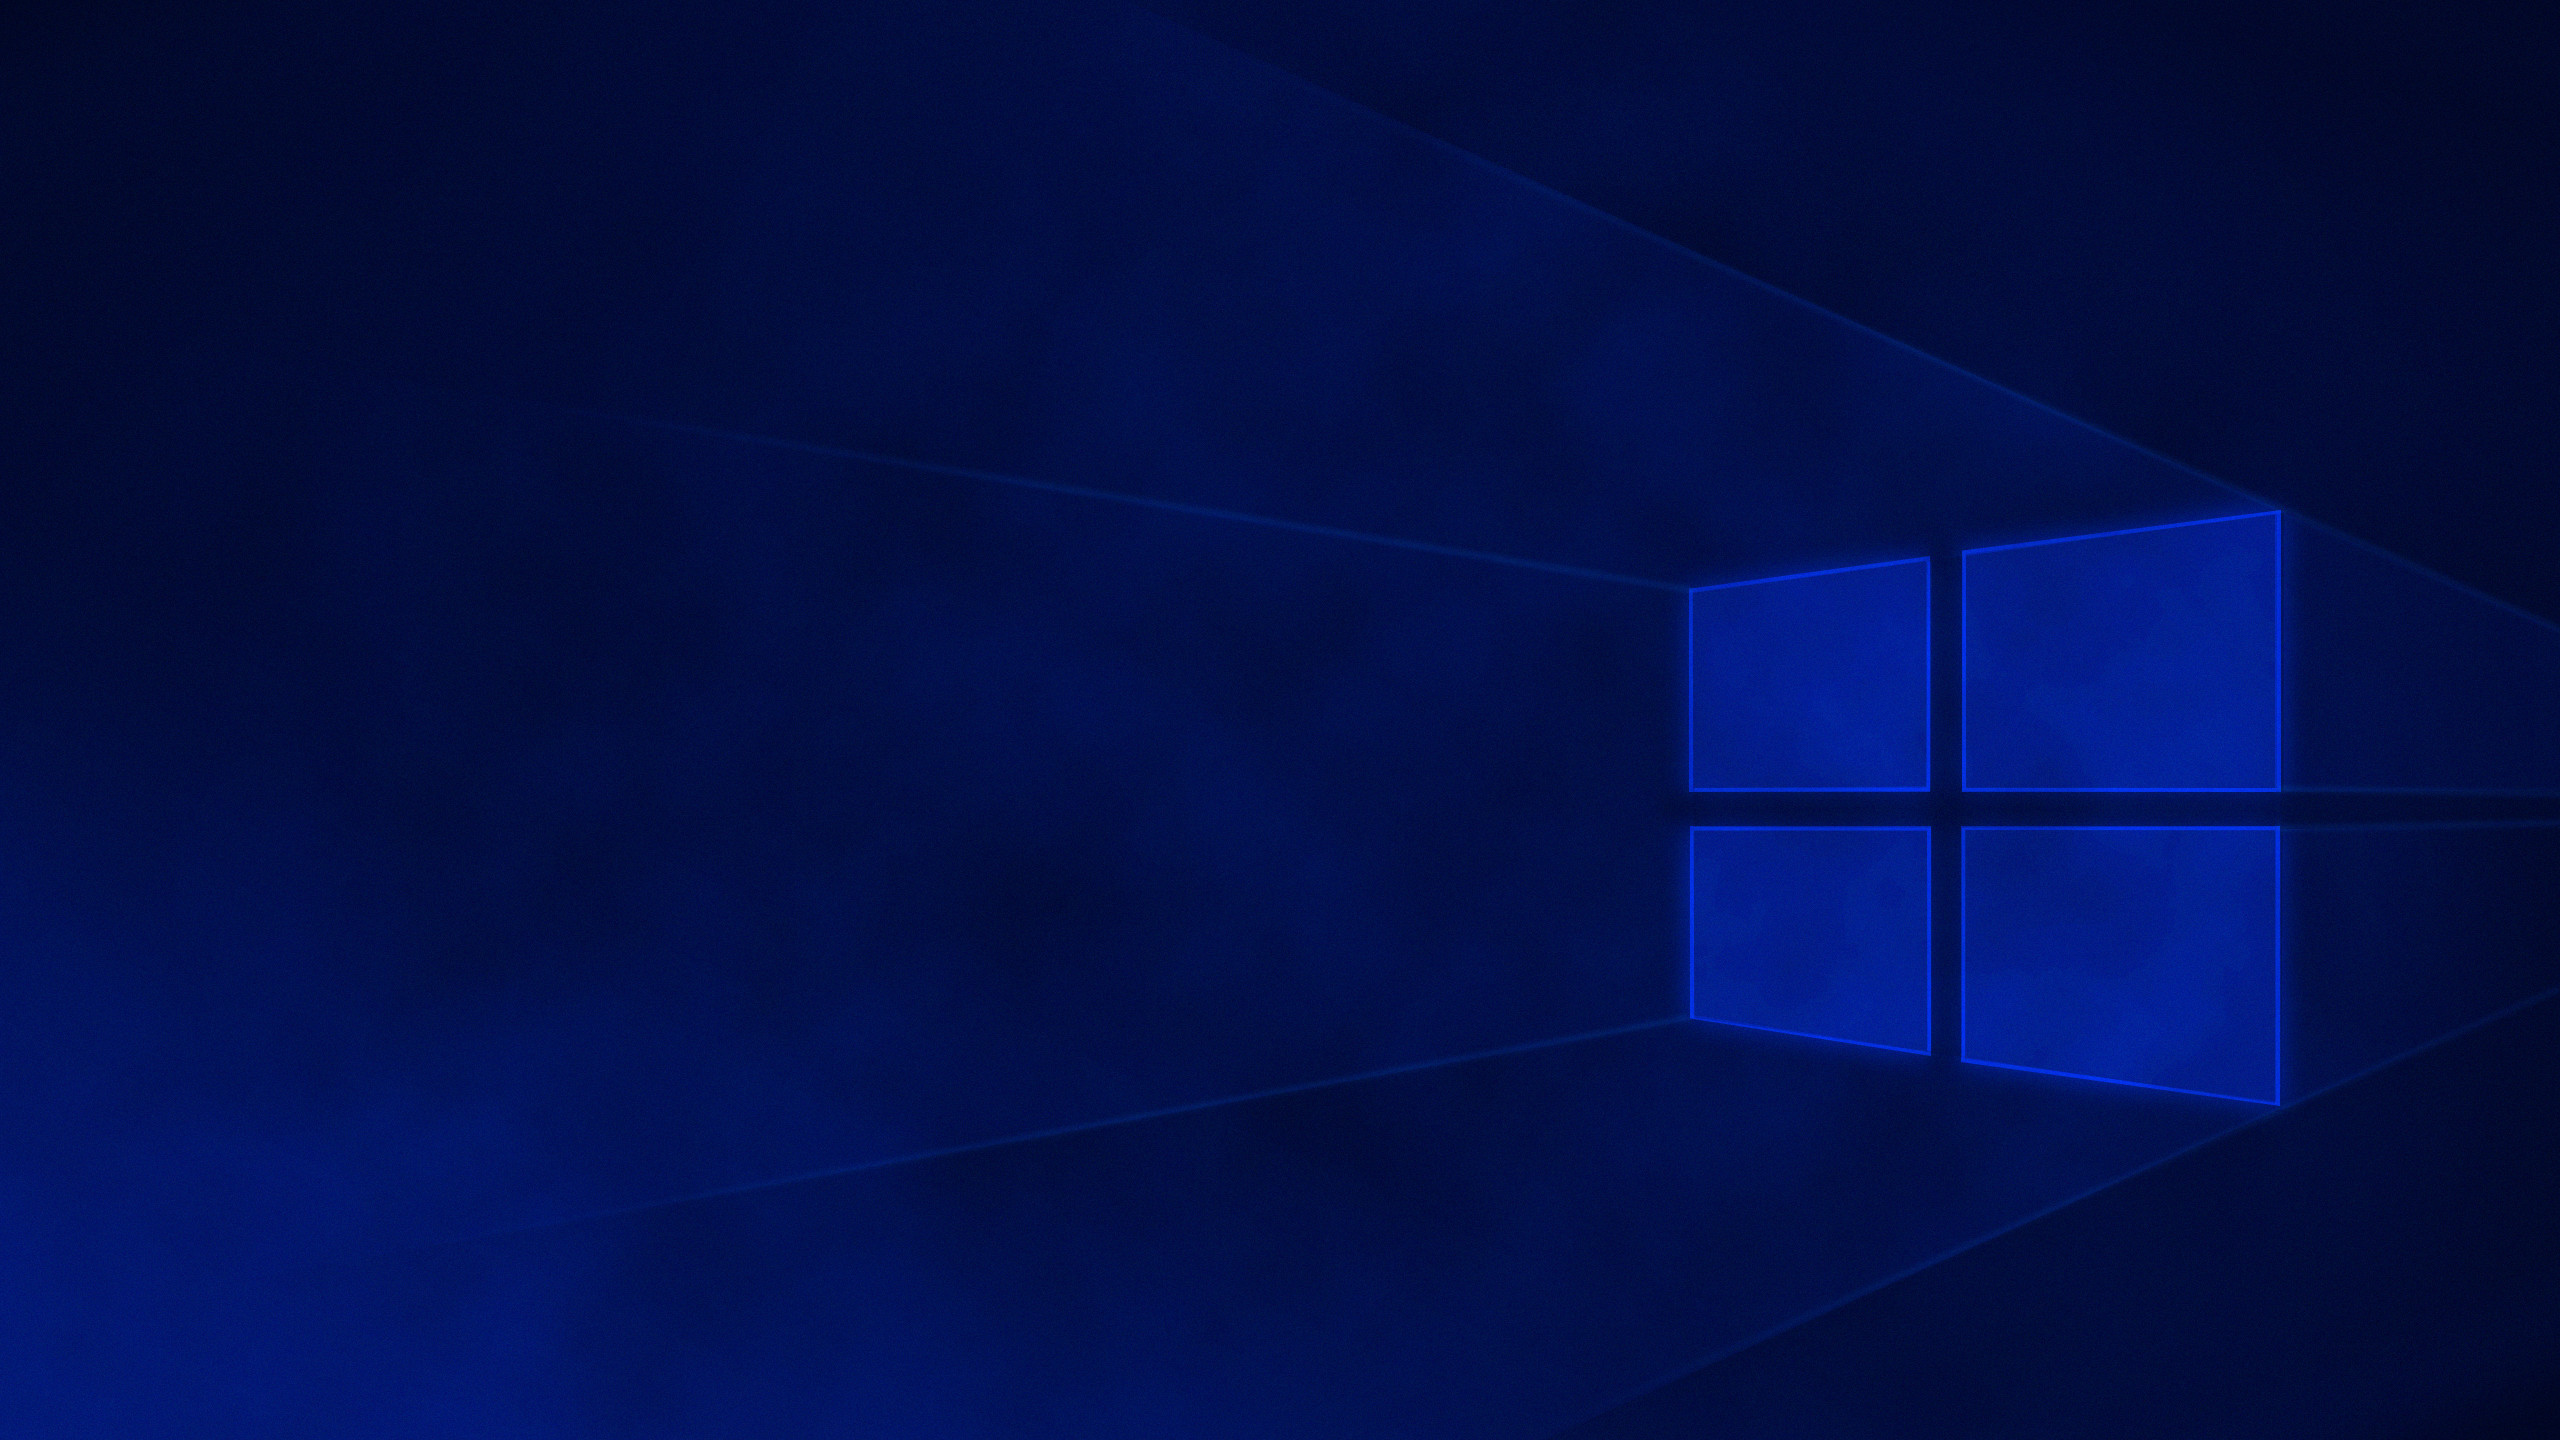 Windows 95 Setup Wallpaper 56 images 2560x1440